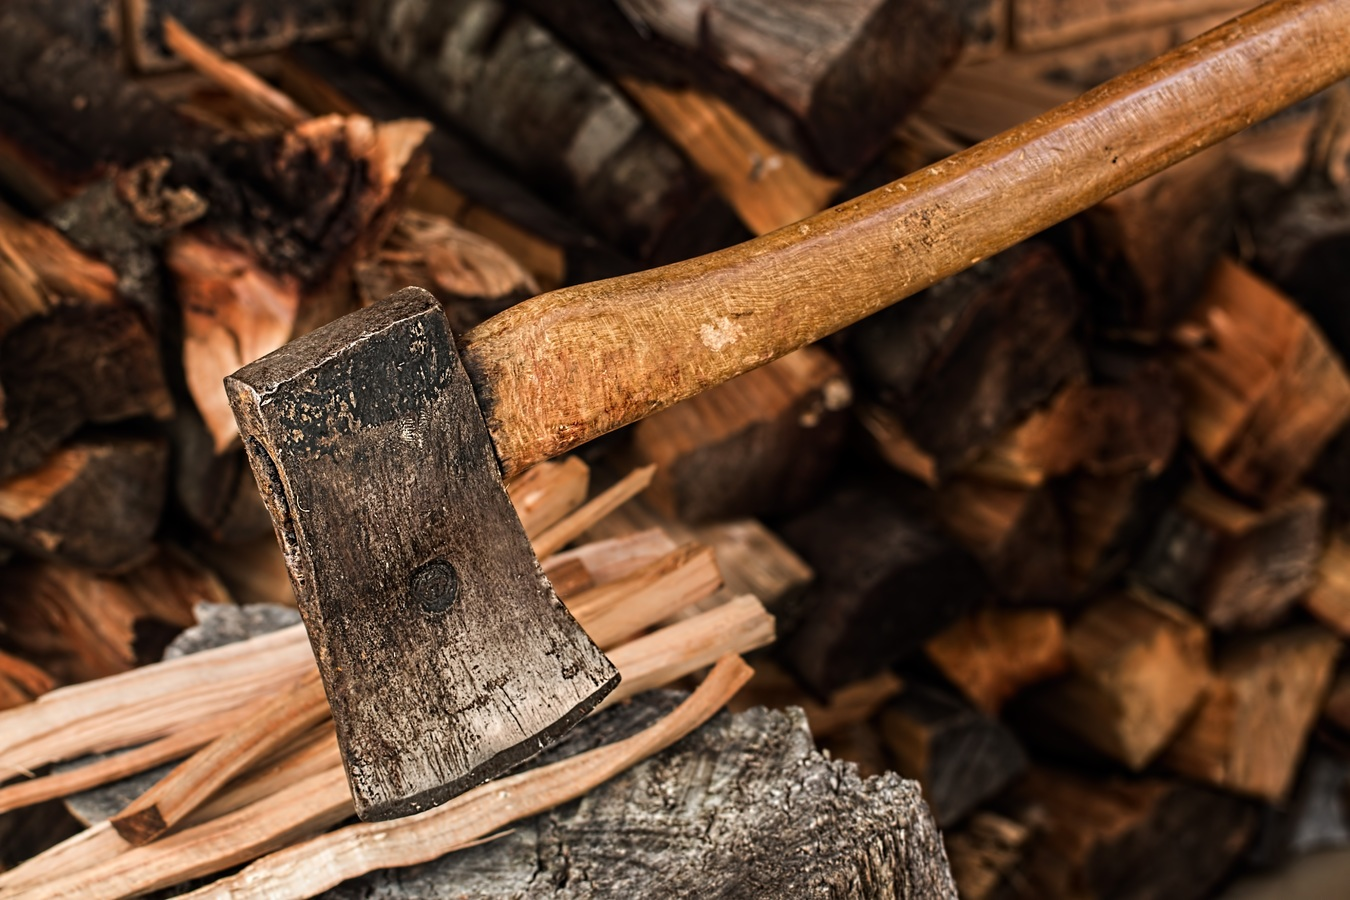 branch-sharp-wood-warm-trunk-tool-1233390-pxhere.com.jpg